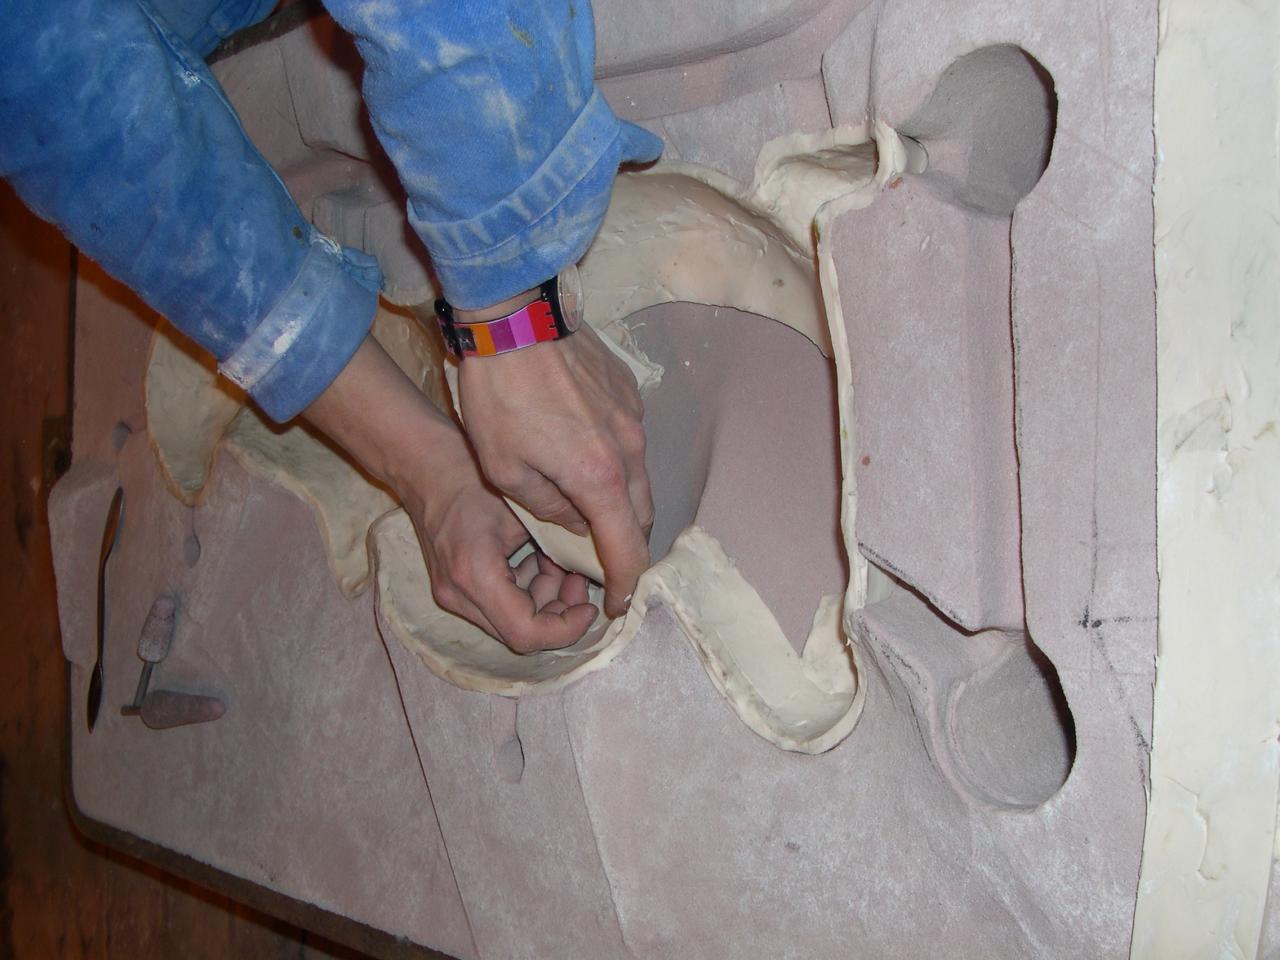 Etaler la plastine (future épaisseur de l'aluminium